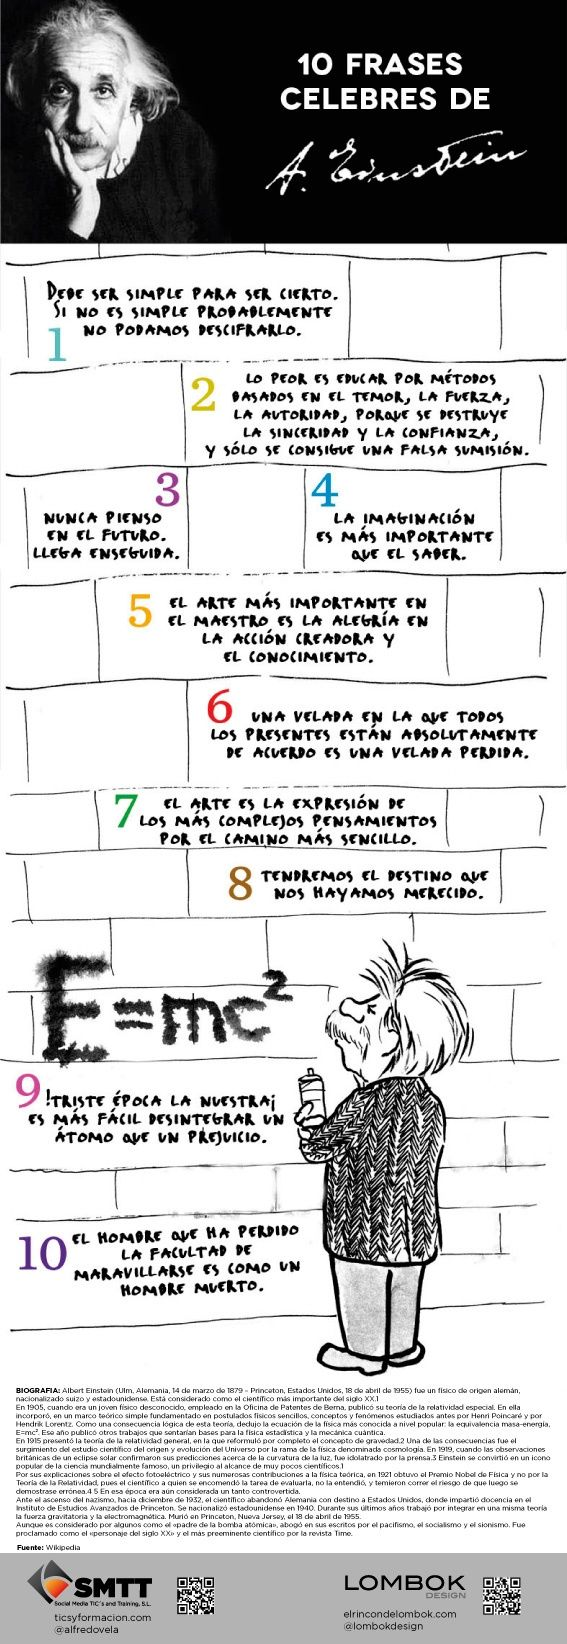 10 Frases de Einstein #umayor #estudiantes